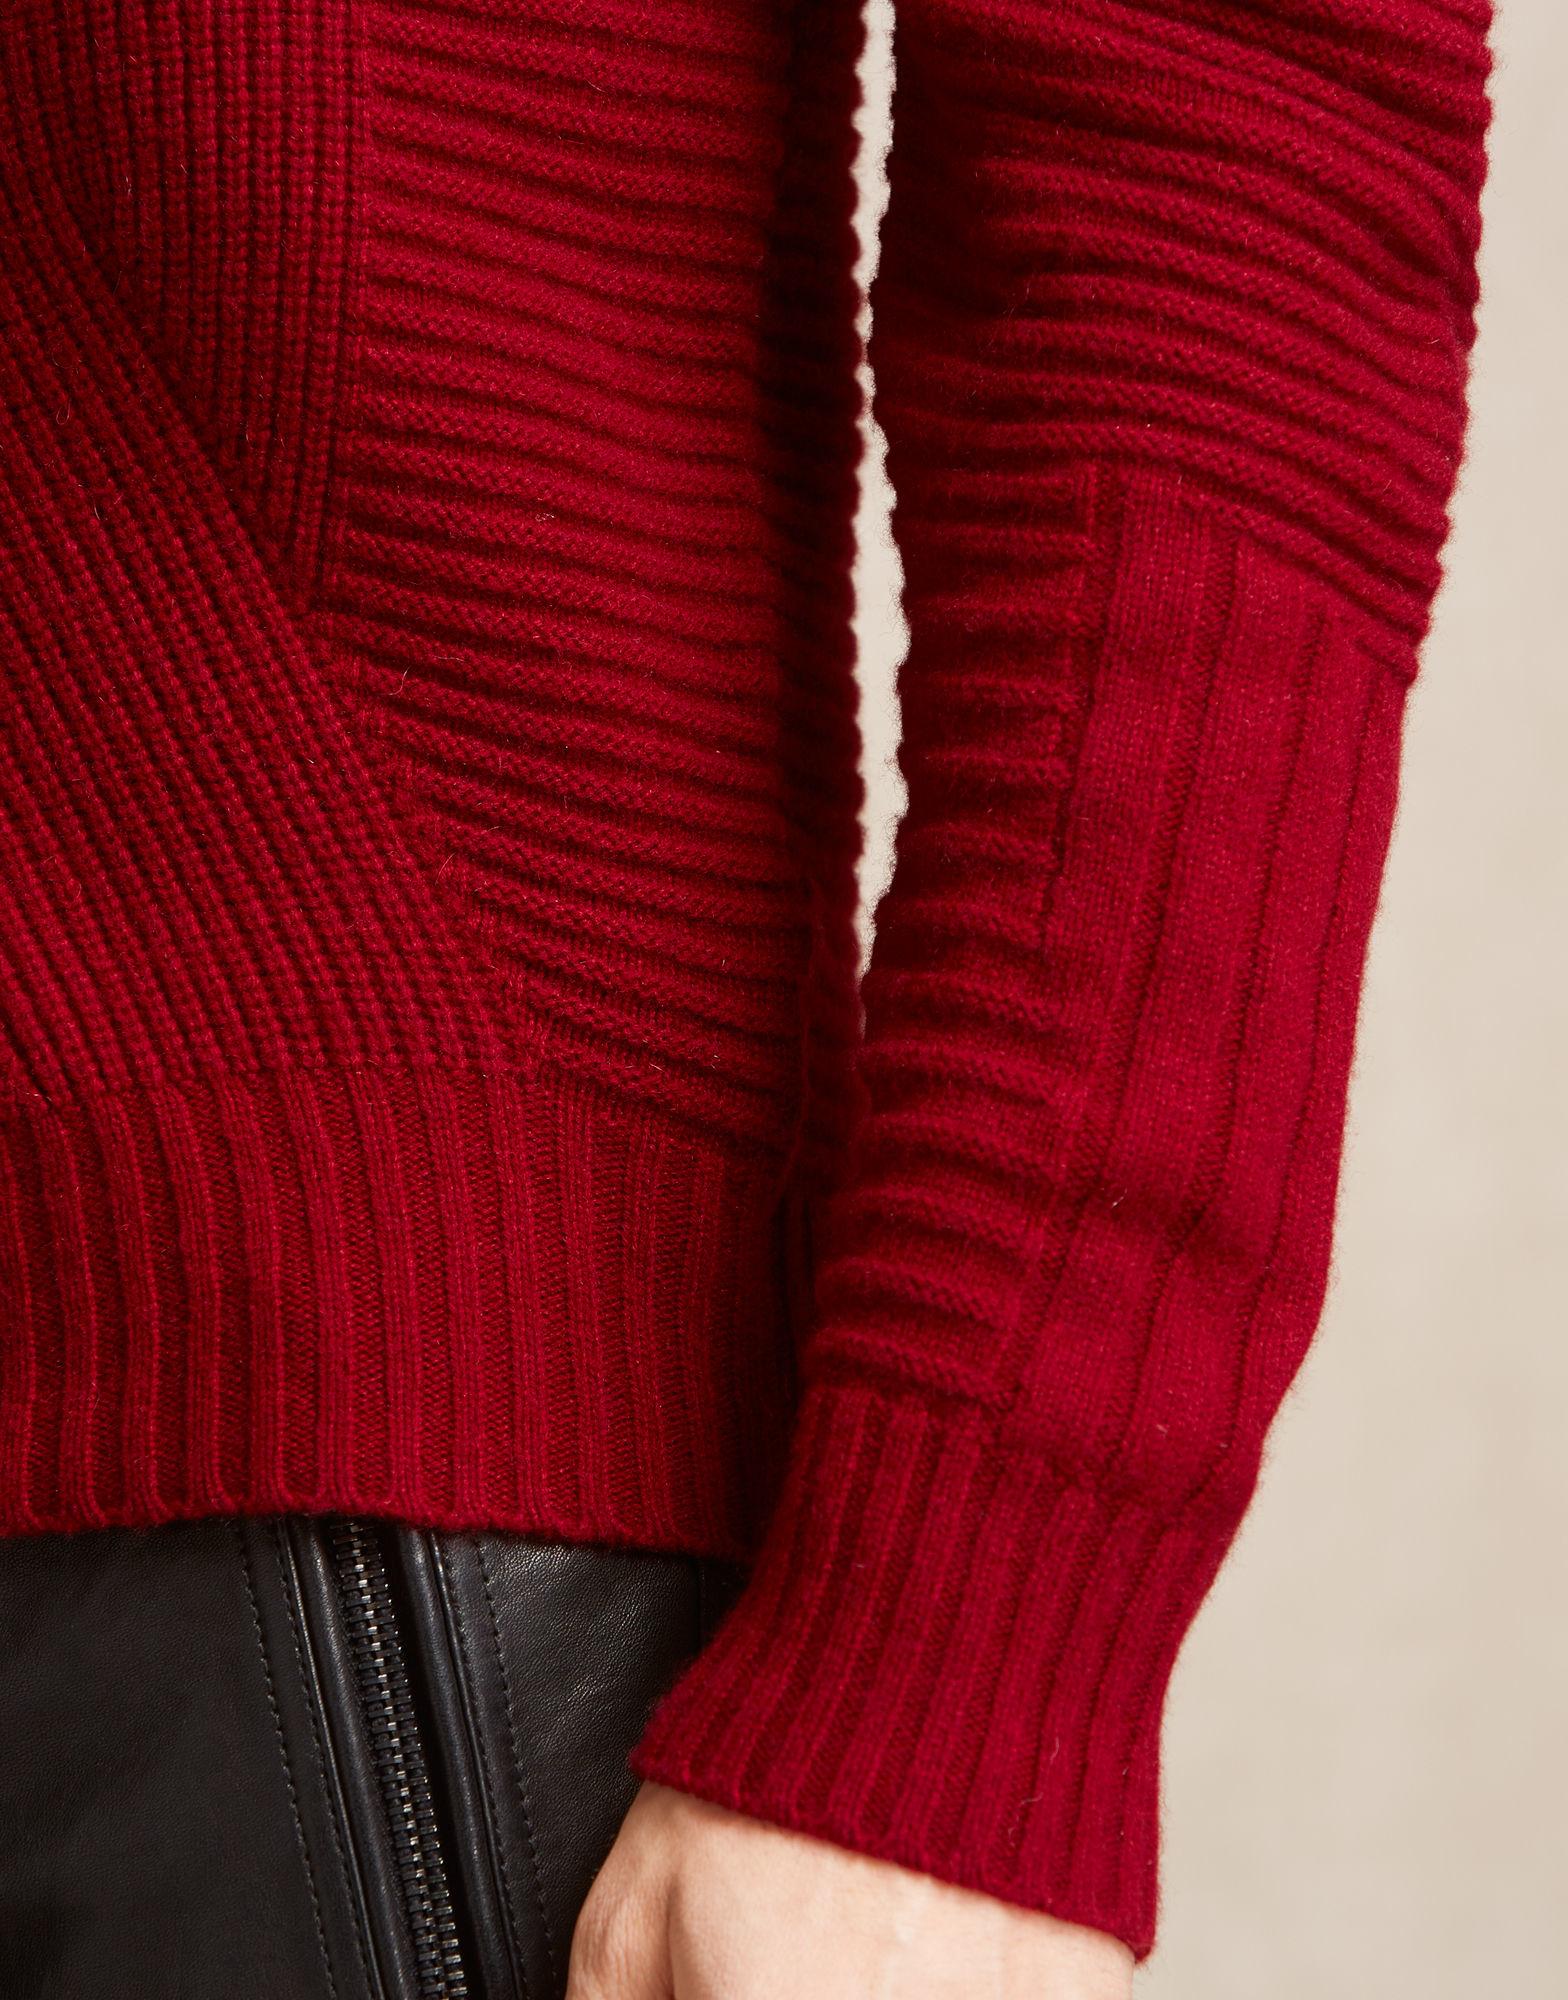 64ab45452c9b Lyst - Belstaff Lincefield Jumper In Dark Red Cashmere Blend in Red ...